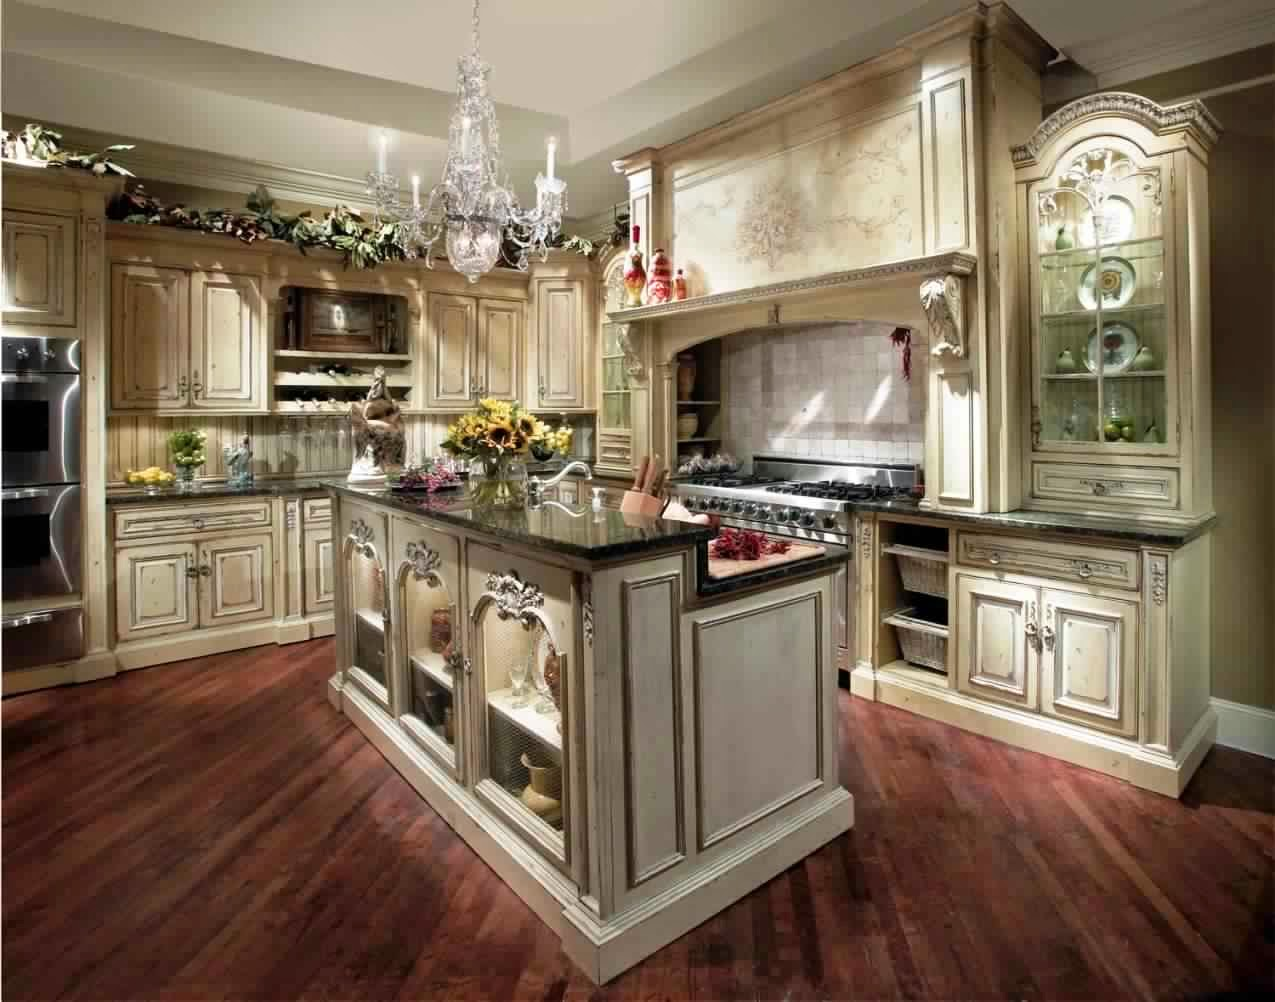 cuisine style anglais dw76 jornalagora. Black Bedroom Furniture Sets. Home Design Ideas